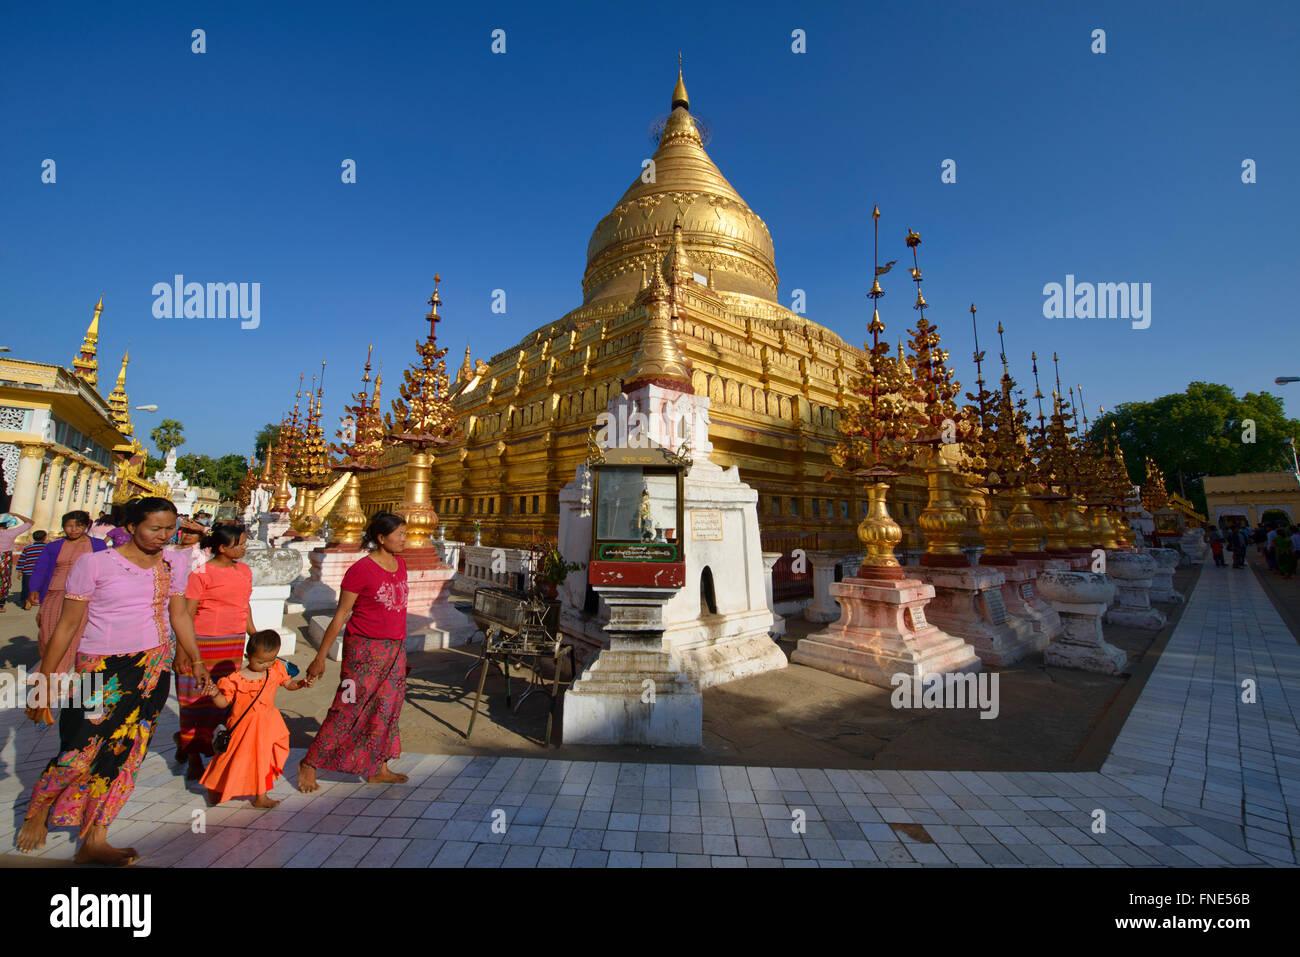 Pilgrims walking at golden Shwezigon Pagoda, Bagan, Myanmar Stock Photo